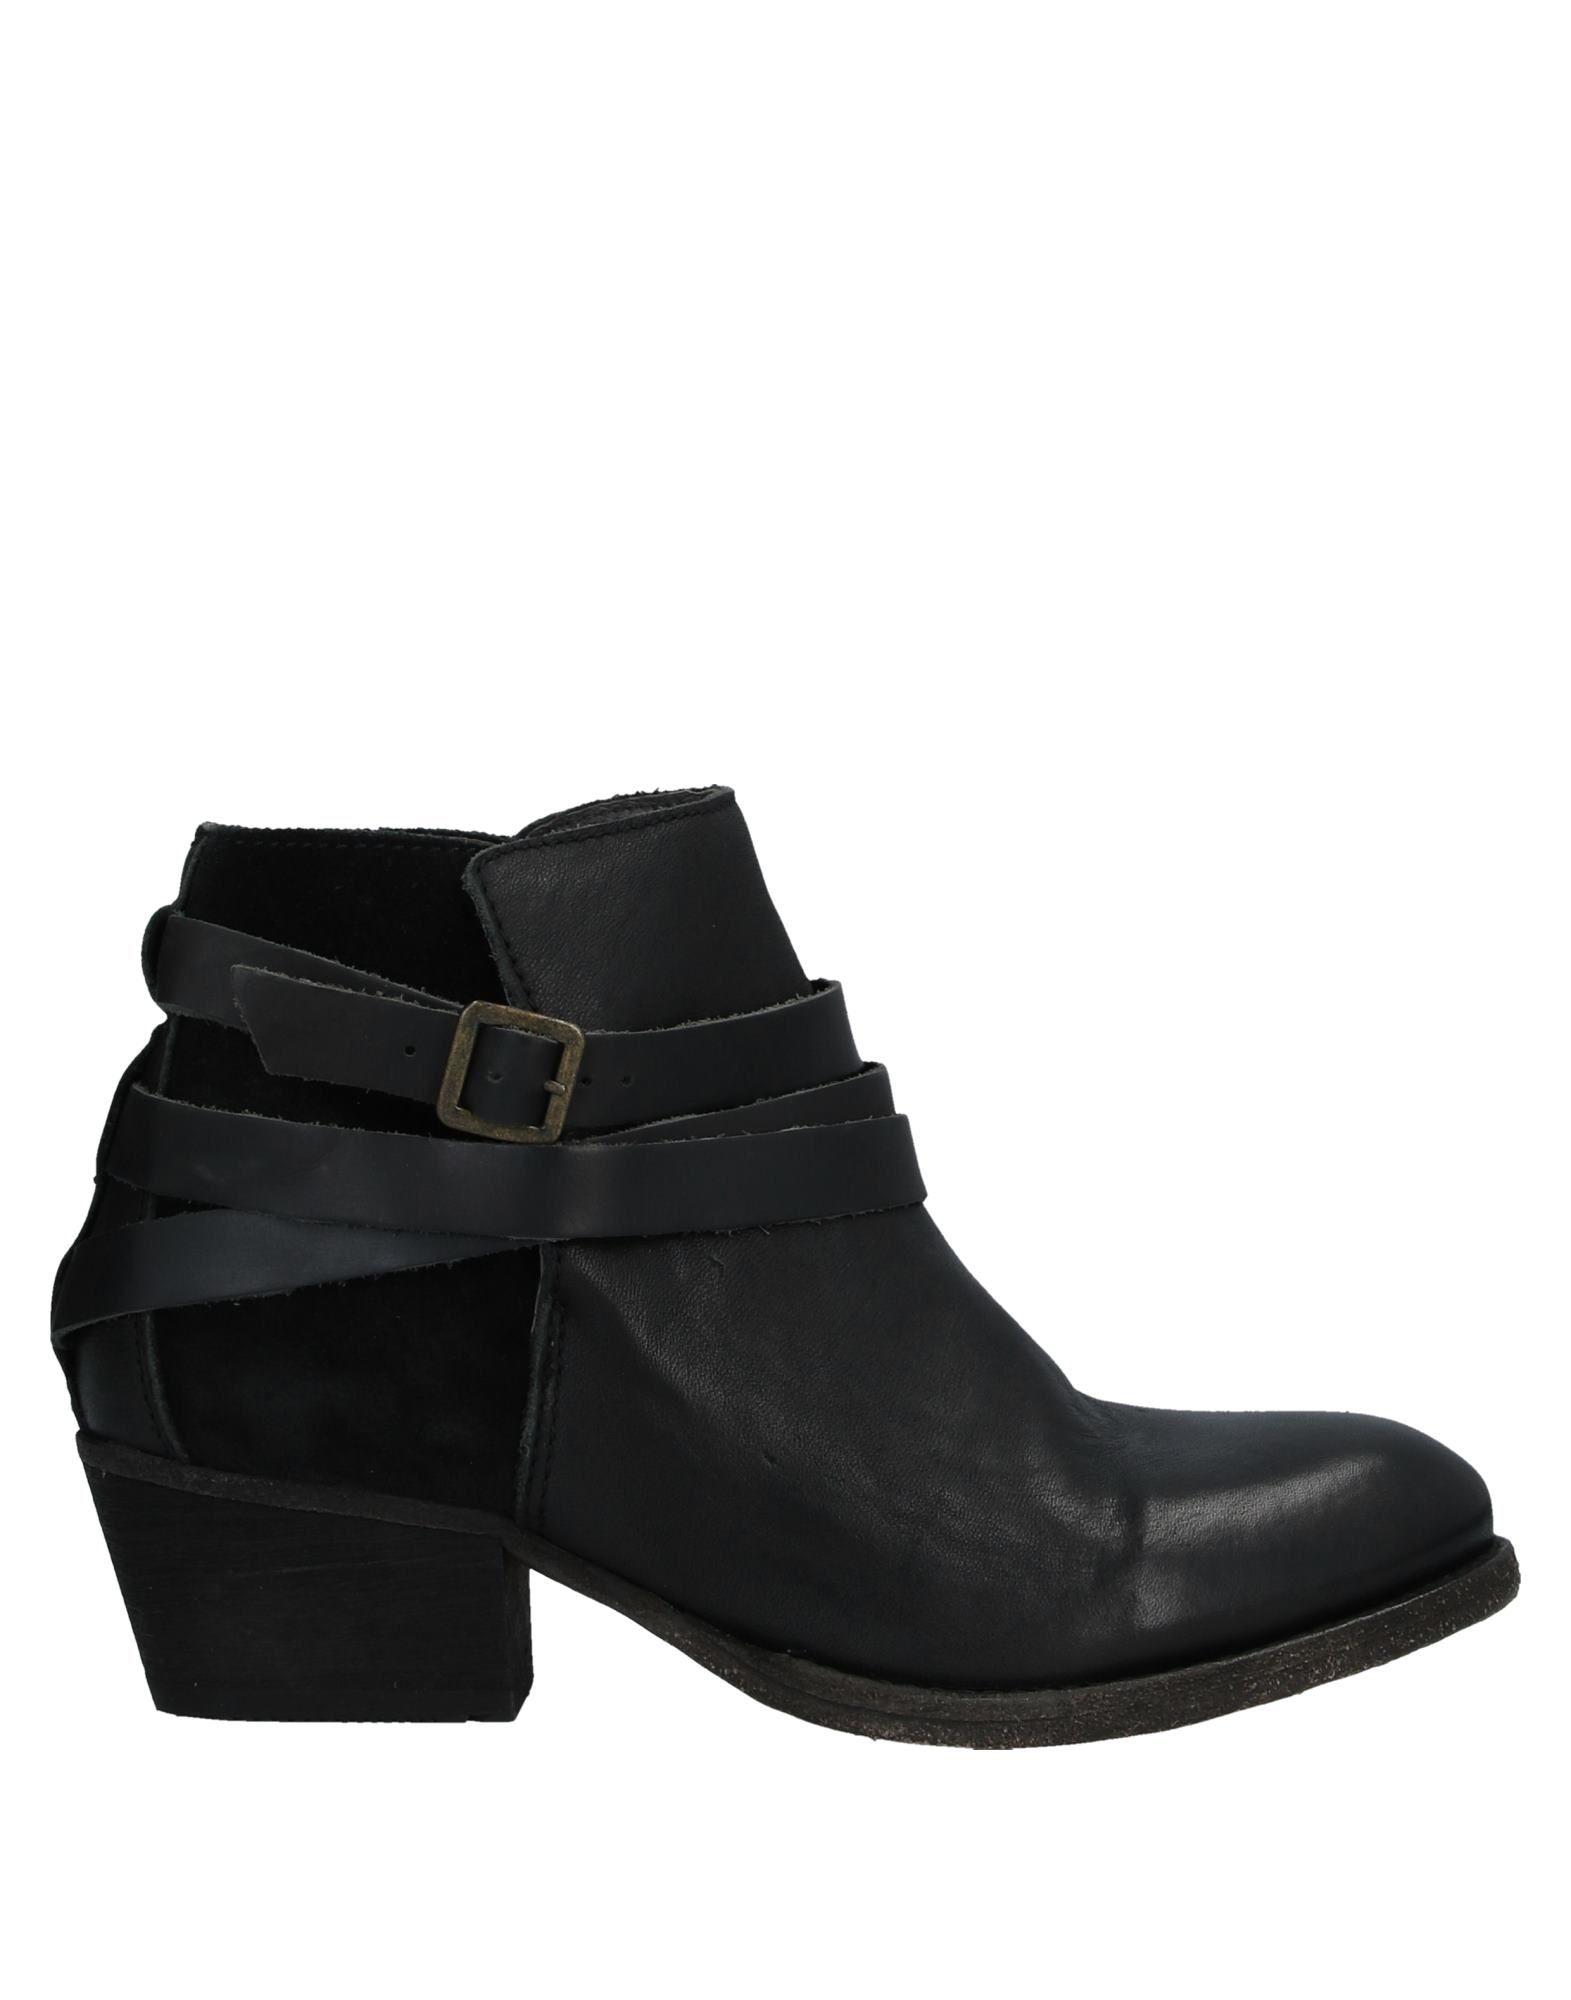 H by HUDSON Полусапоги и высокие ботинки h by hudson полусапоги и высокие ботинки